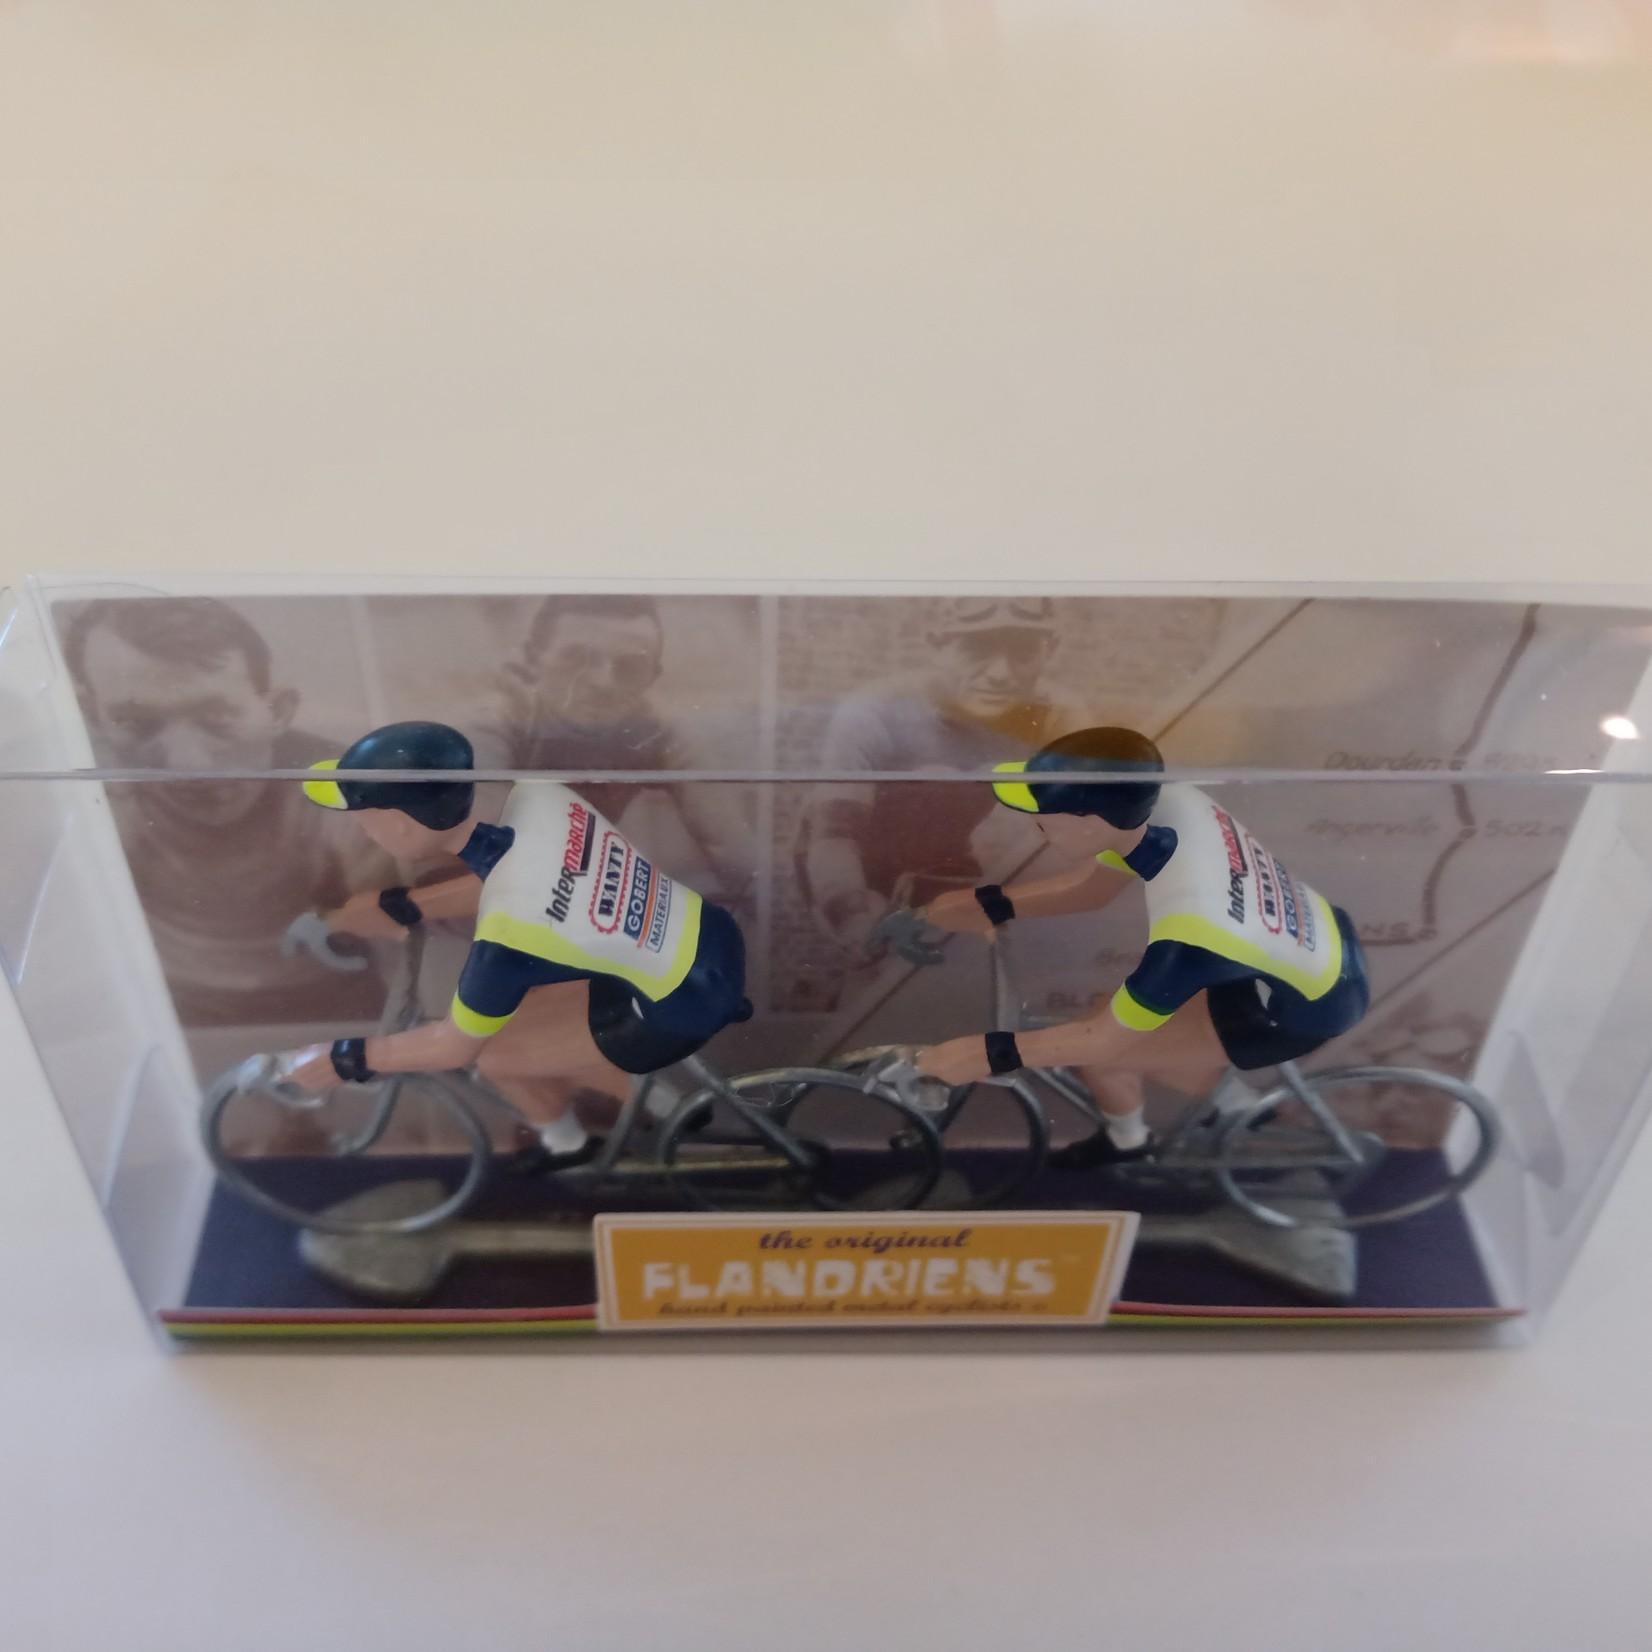 Miniature 'Wanty/Intermarché 2021'